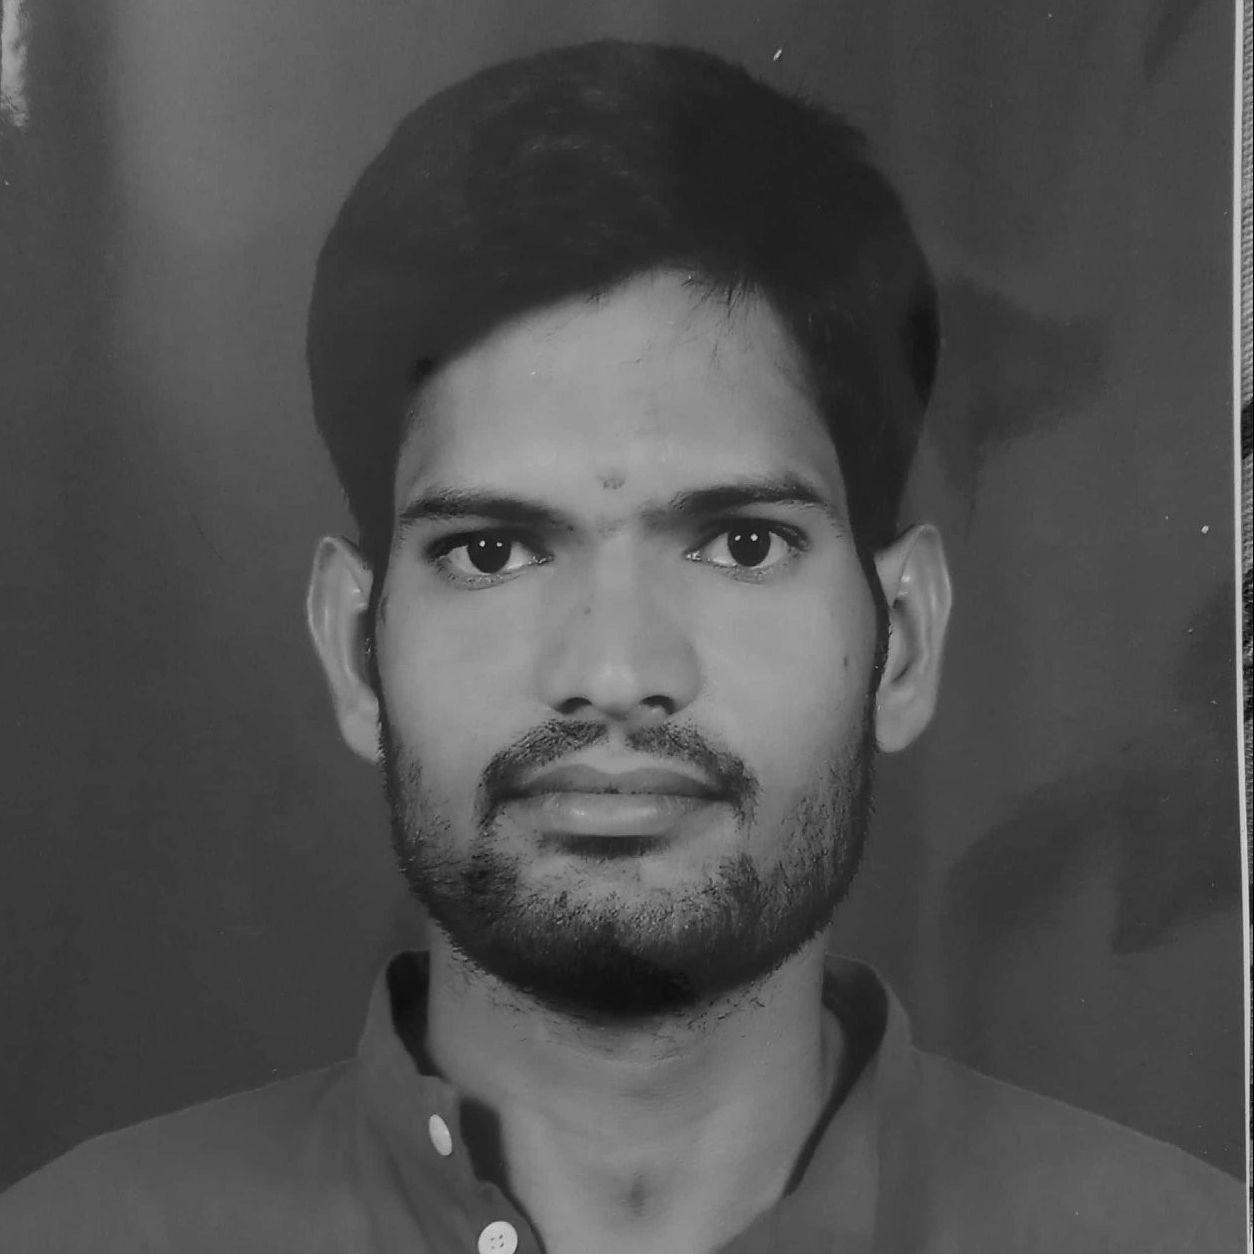 SK Shastri